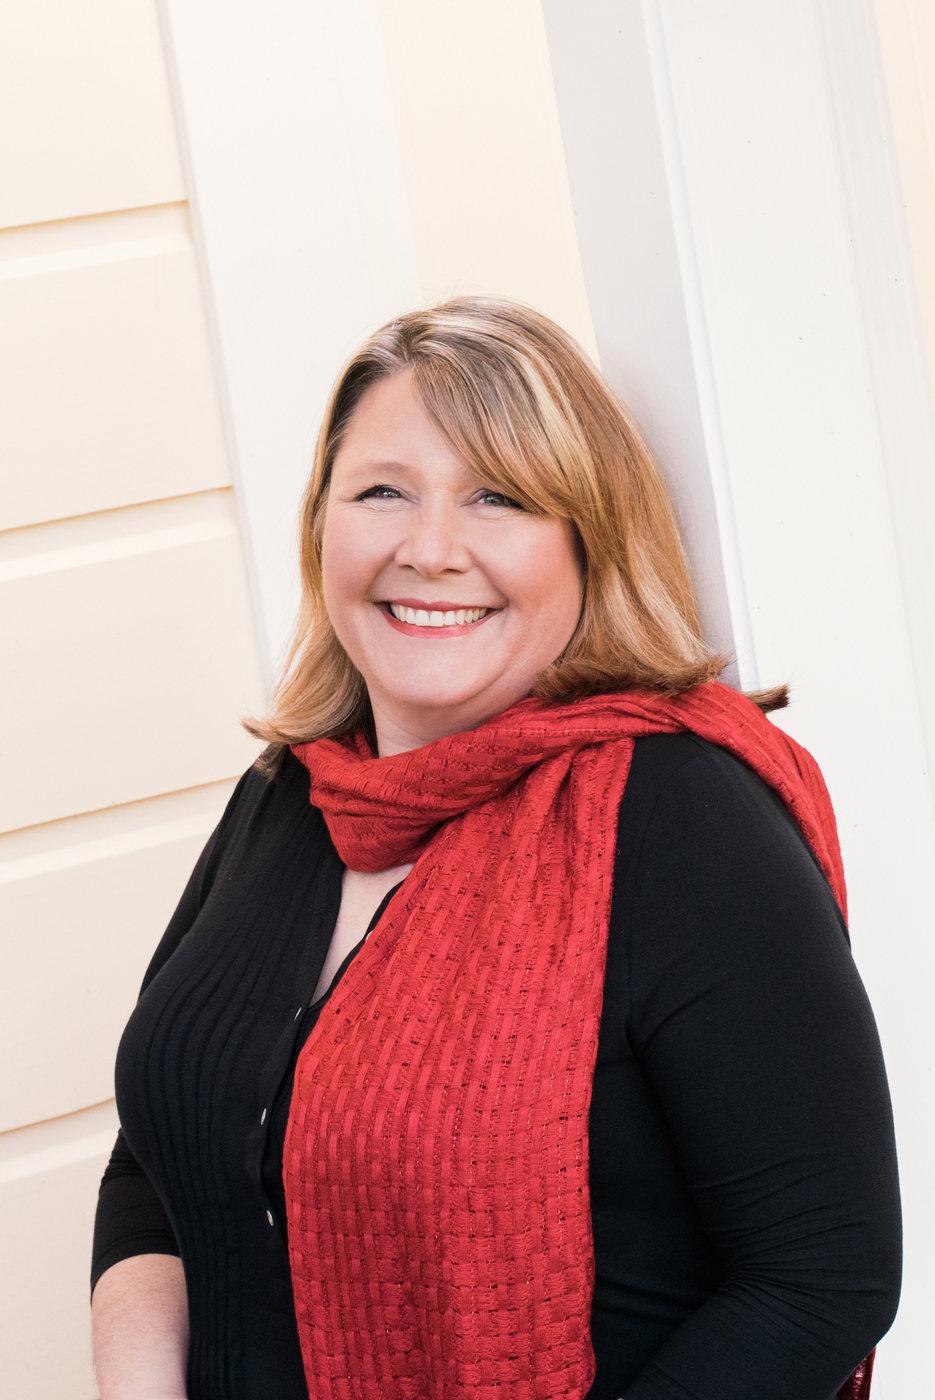 Jennifer Bosma, Vice President of Harvest Market